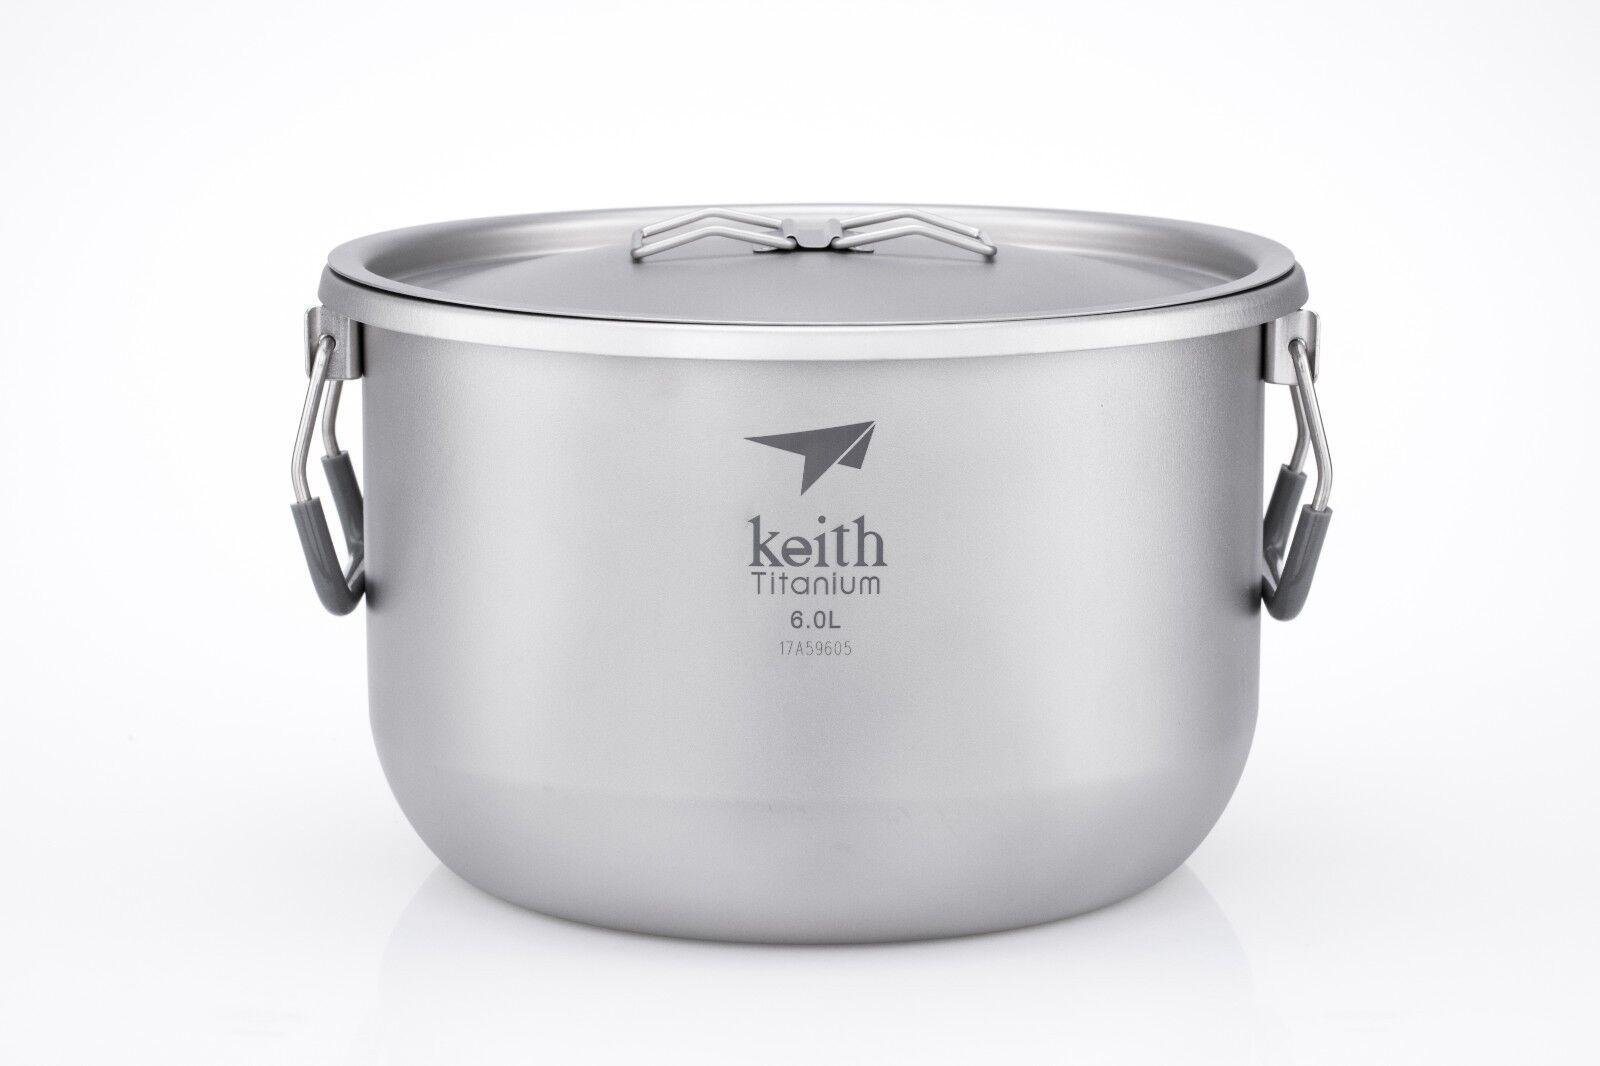 Keith Titanium Ti8301 Pot - 6.0 L (expédiés de Keith Titanium Warehouse in USA)